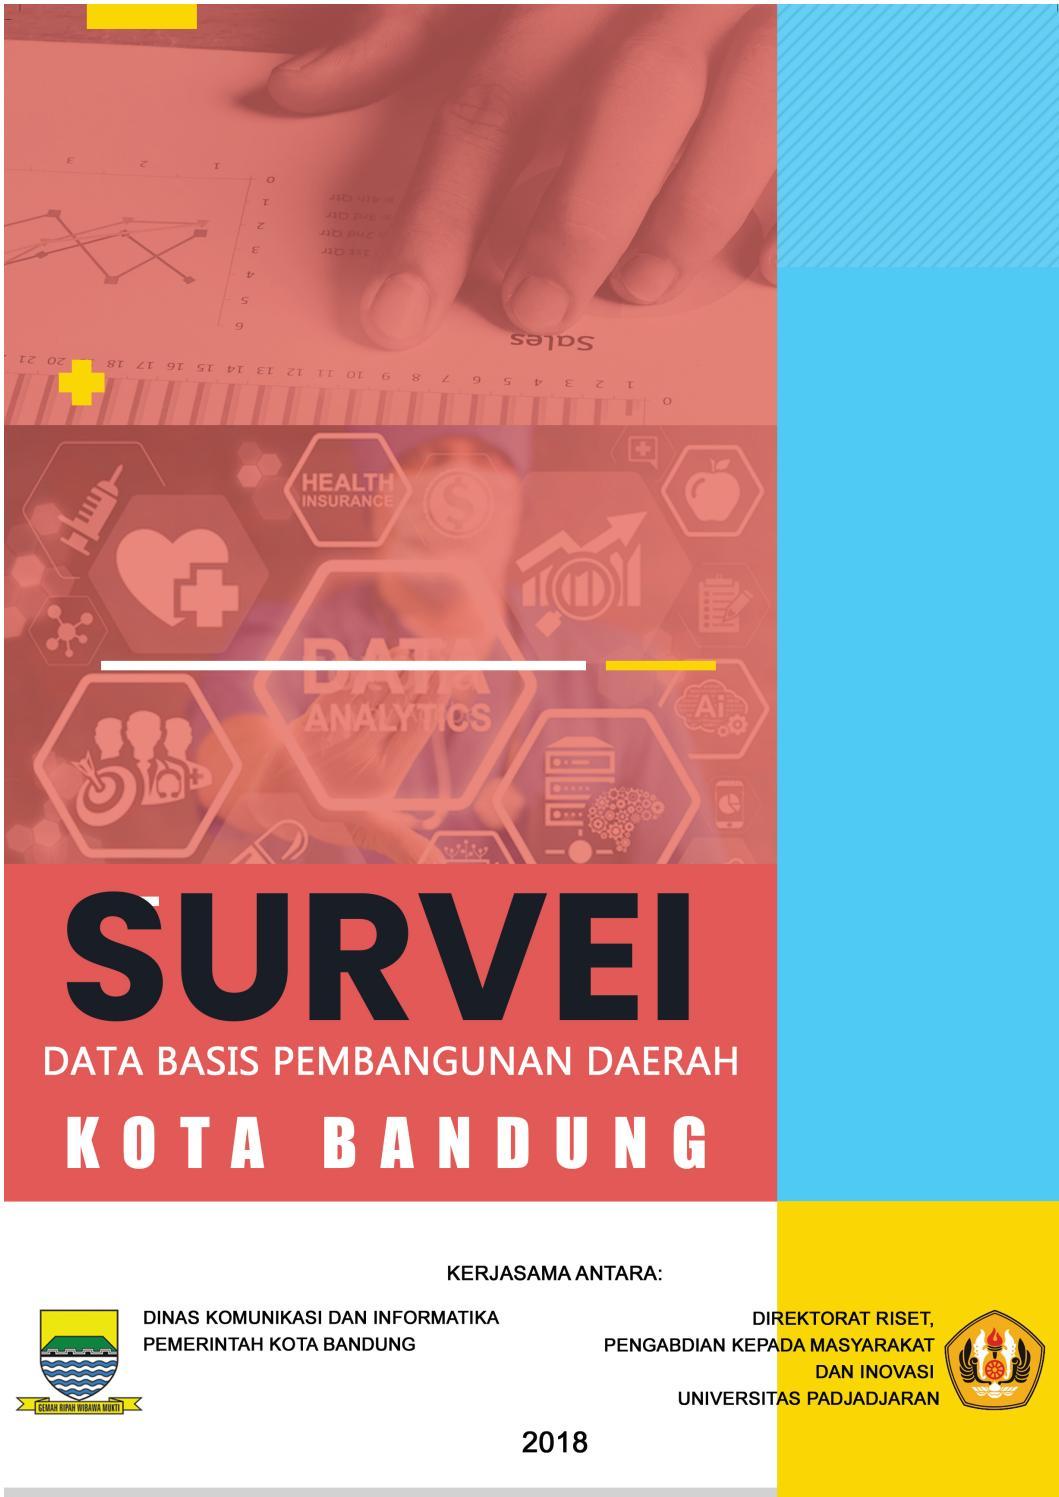 Survei Data Basis Pembangunan Daerah Kota Bandung Tahun 2018 By Open Data Kota Bandung Issuu